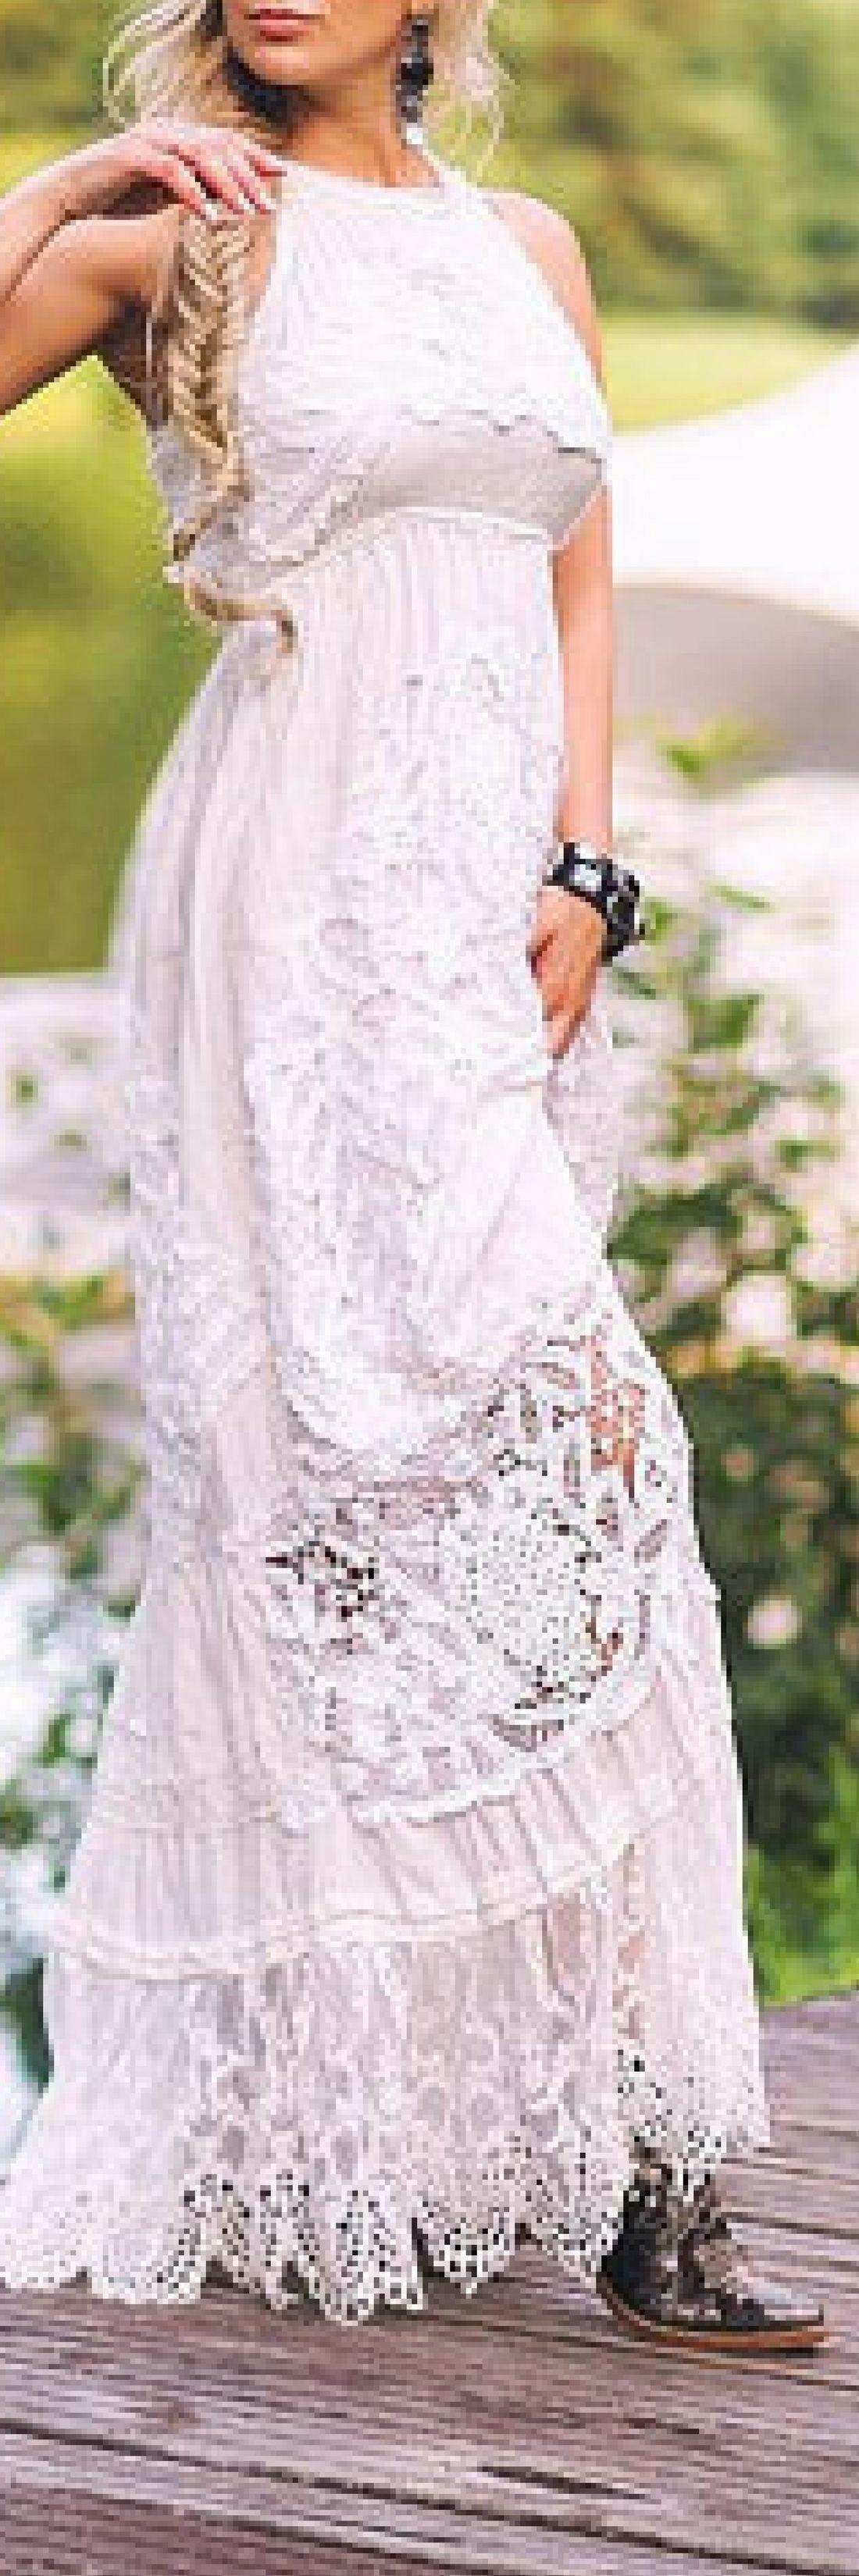 Boho beach wedding dress vintage ivory cotton lace wedding dress